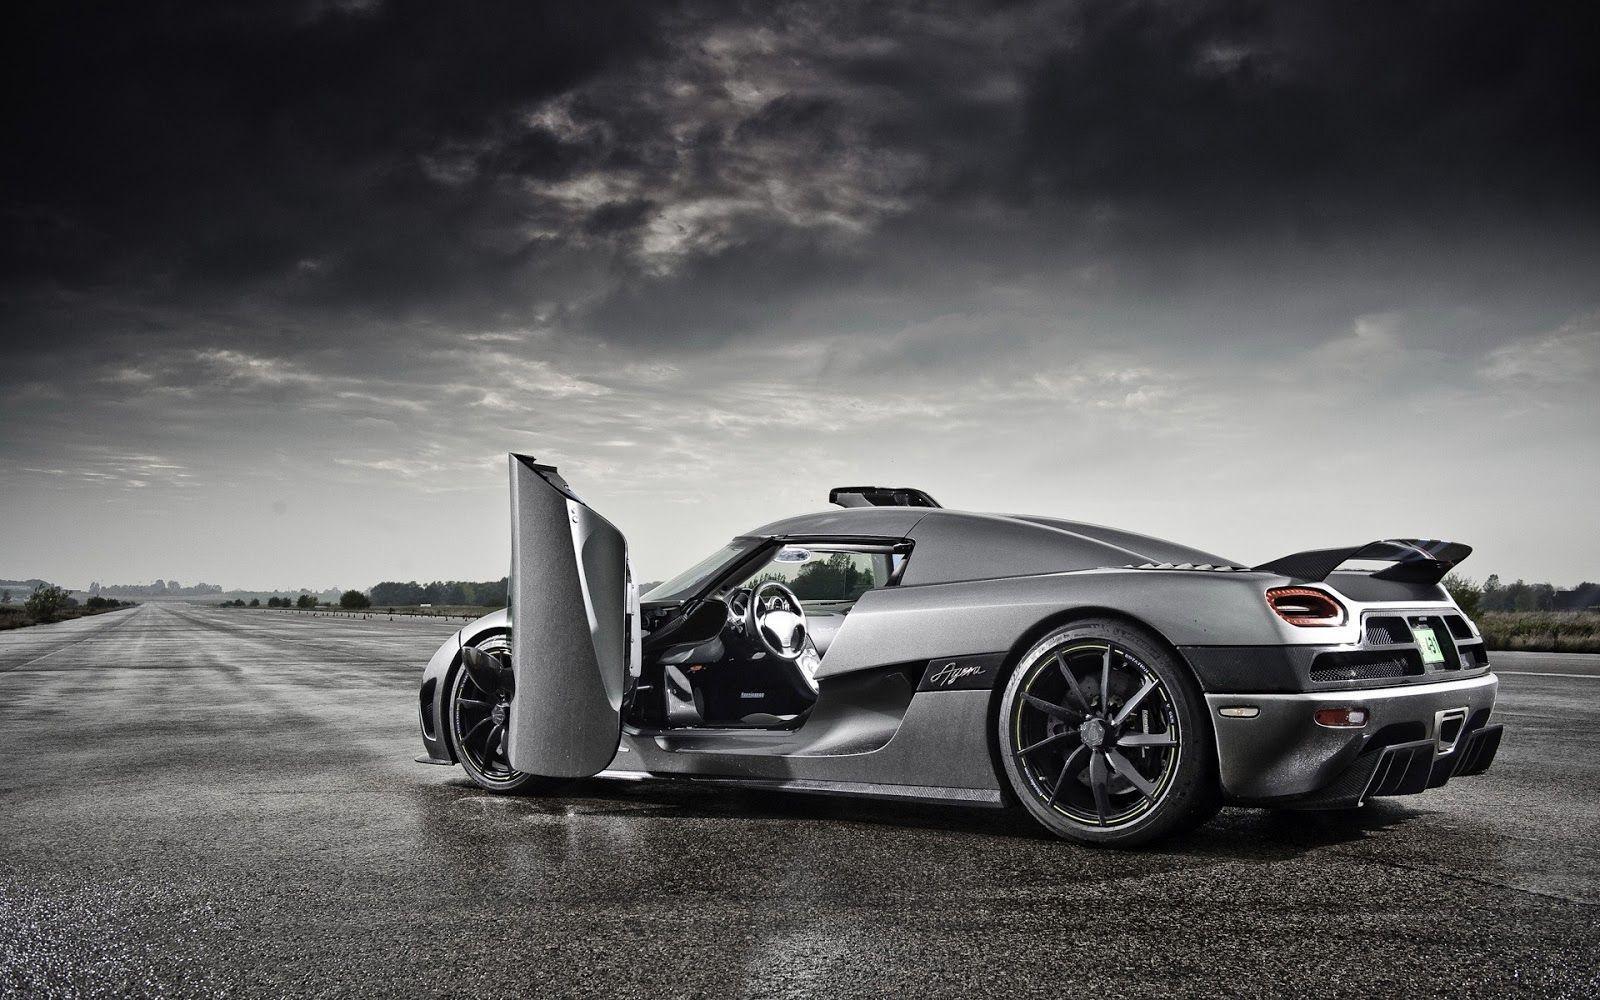 Supercar Wallpapers Desktop Koenigsegg Sports Cars Luxury Sports Cars